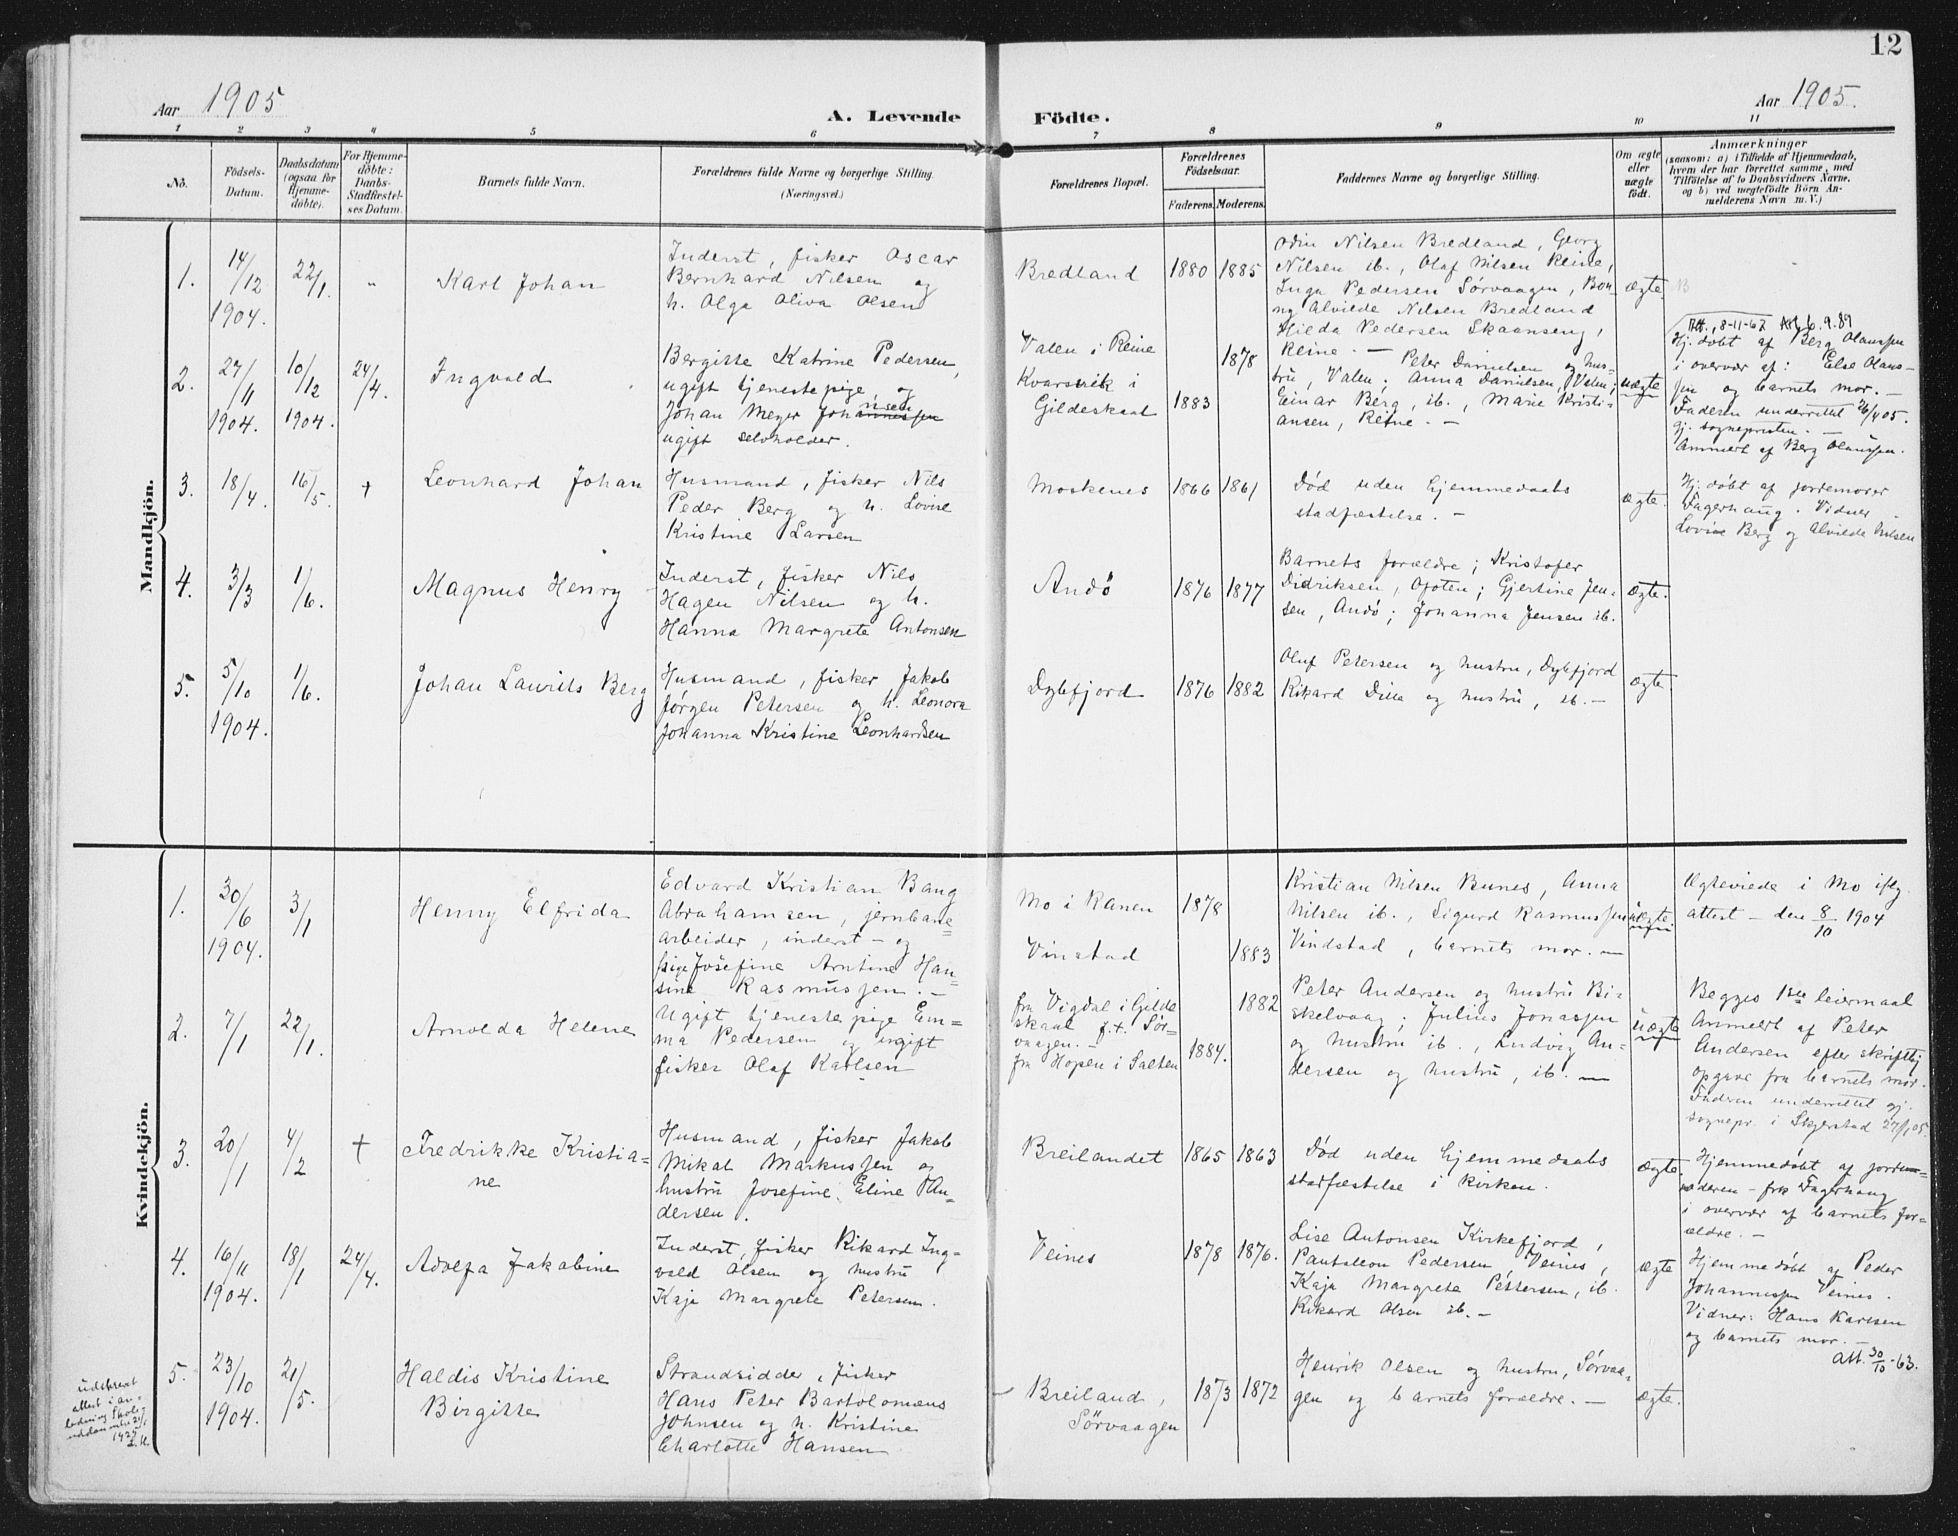 SAT, Ministerialprotokoller, klokkerbøker og fødselsregistre - Nordland, 886/L1221: Ministerialbok nr. 886A03, 1903-1913, s. 12